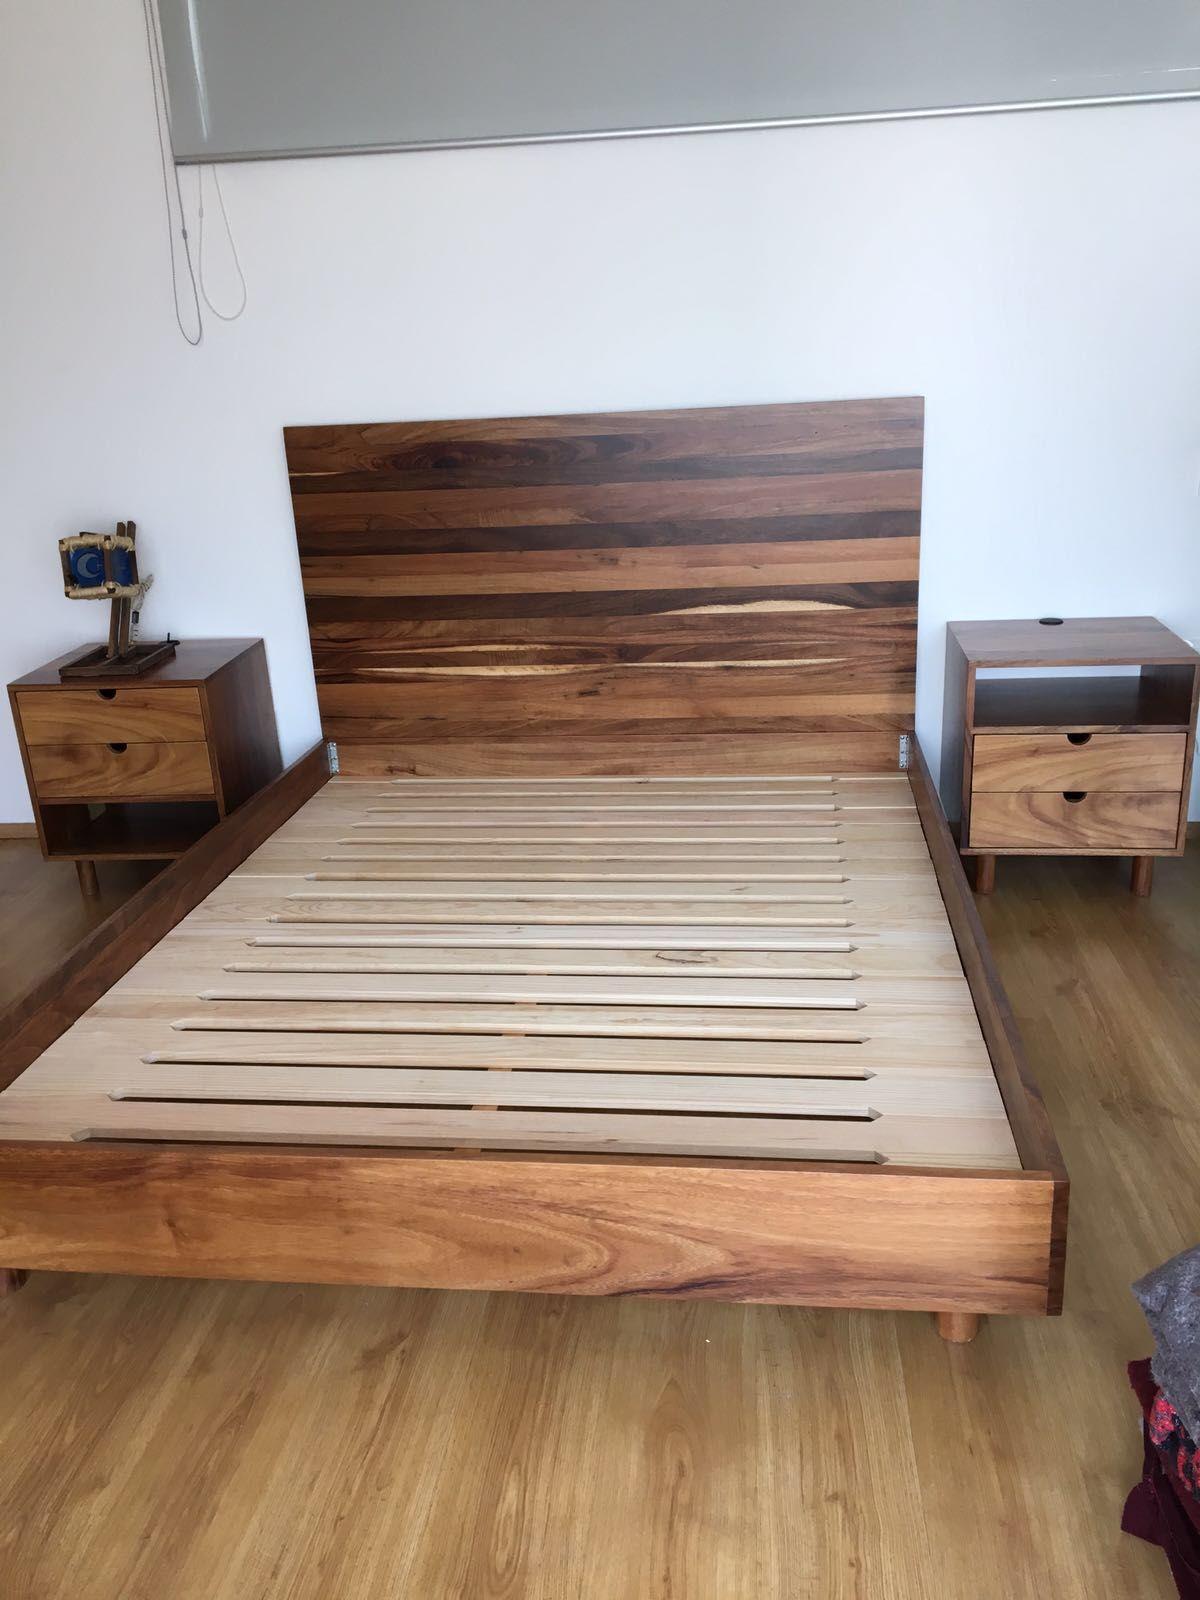 Base de cama y cabecera de madera de huanacastle bases for Base de cama